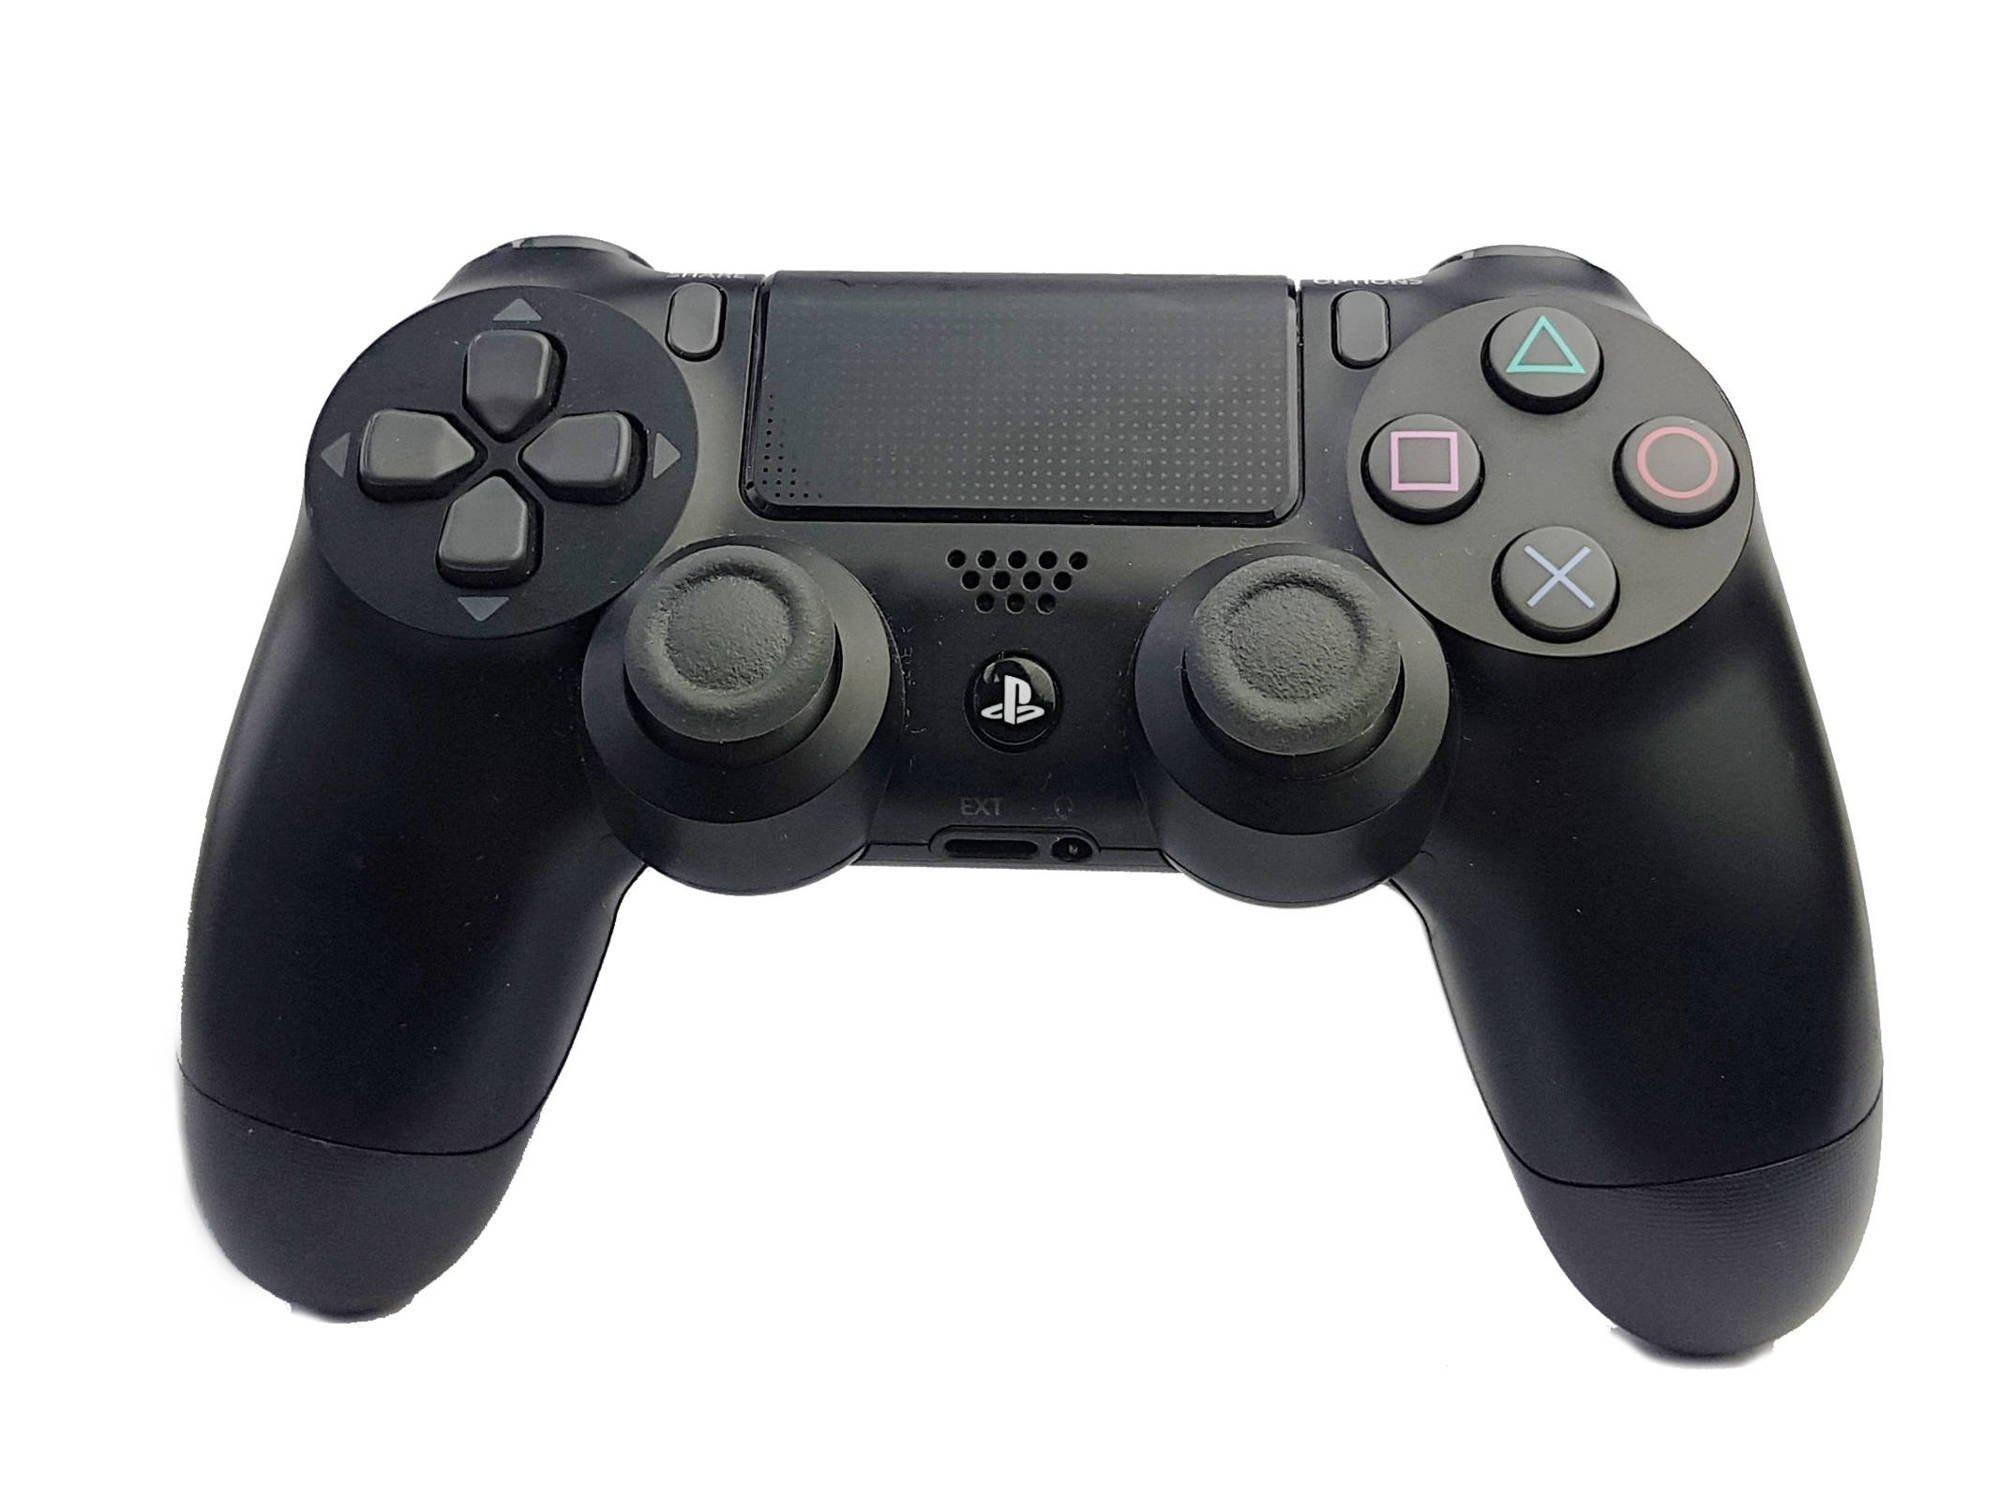 PS4 - Original Sony DualShock 4 Wireless Controller Playstation 4 V2 Pad control